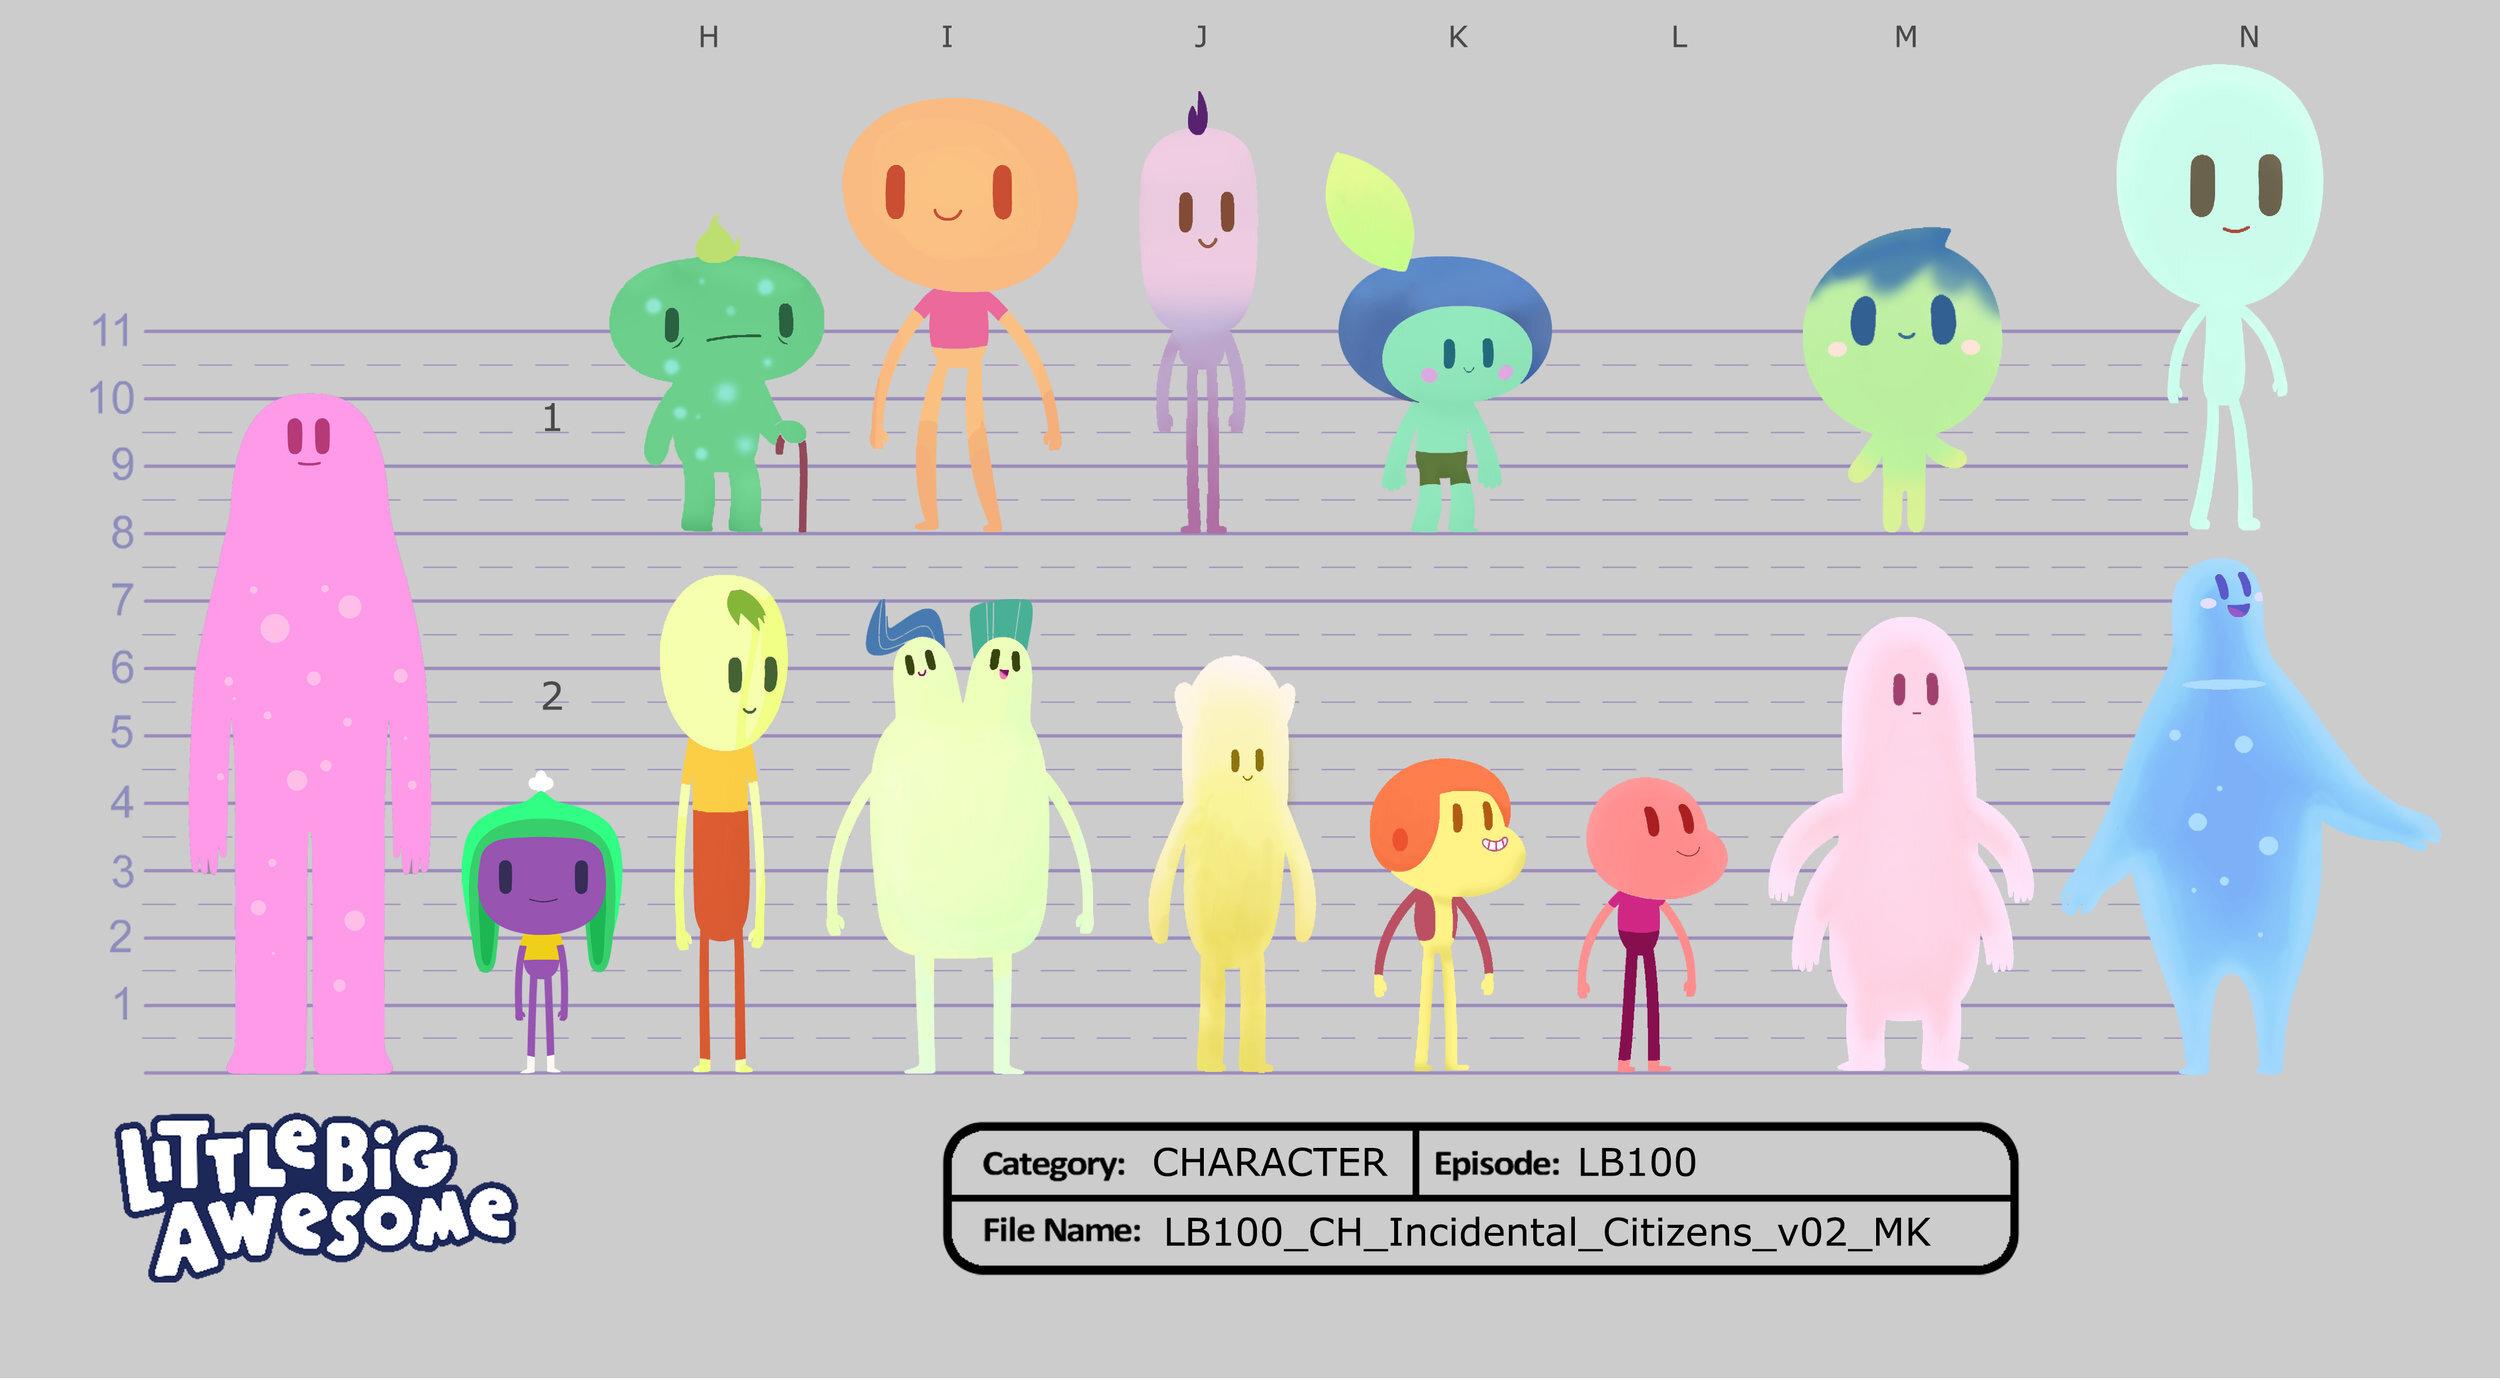 LB100_CH_Incidental_Citizens_01a_Color_v02_MK copy.jpg